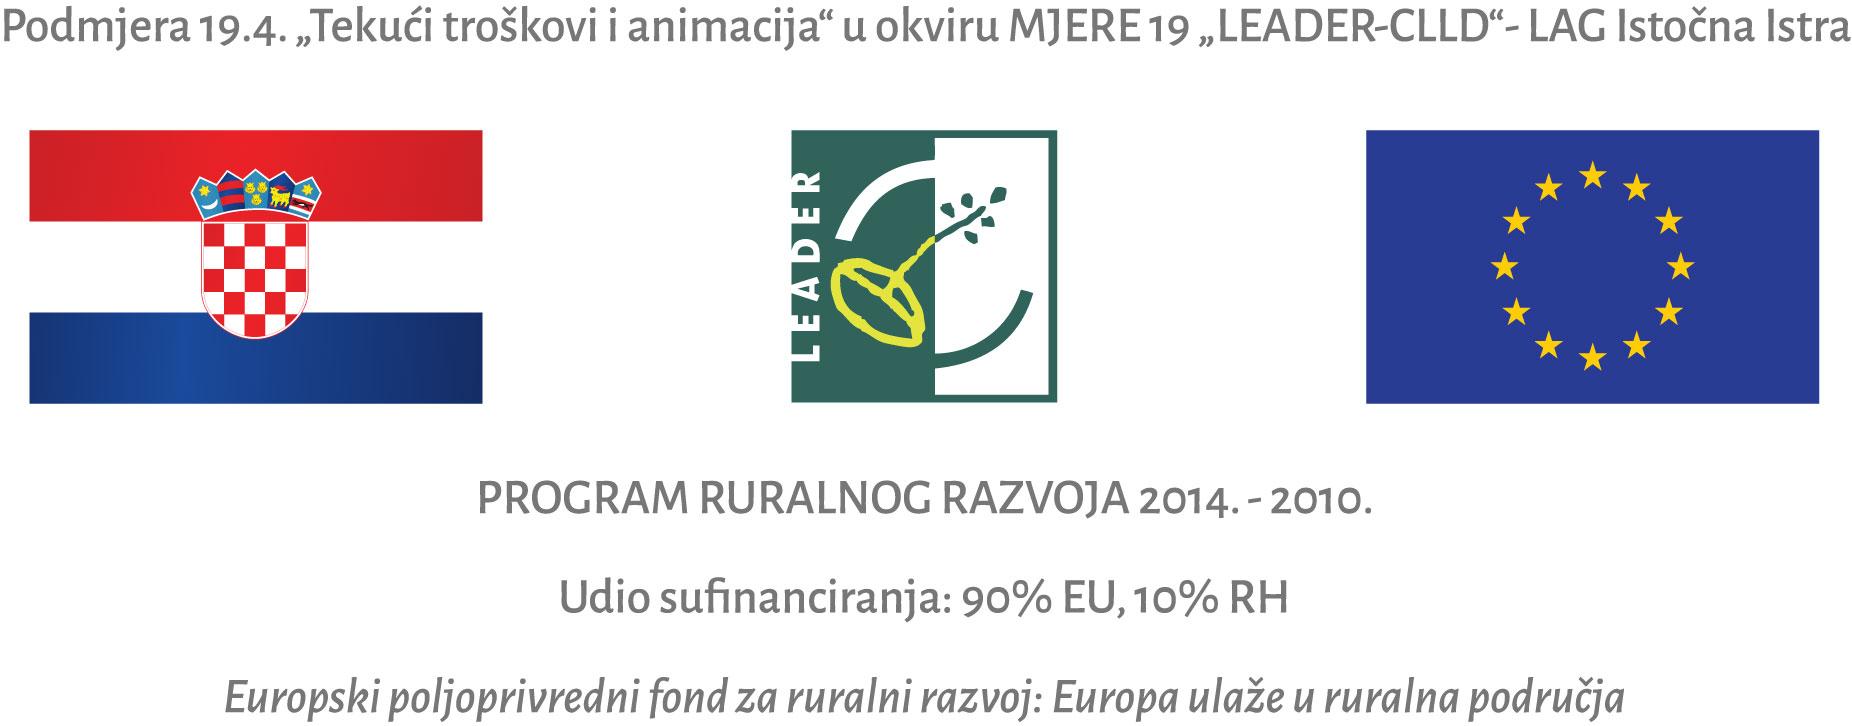 Europski poljoprivredni fond za ruralni razvoj